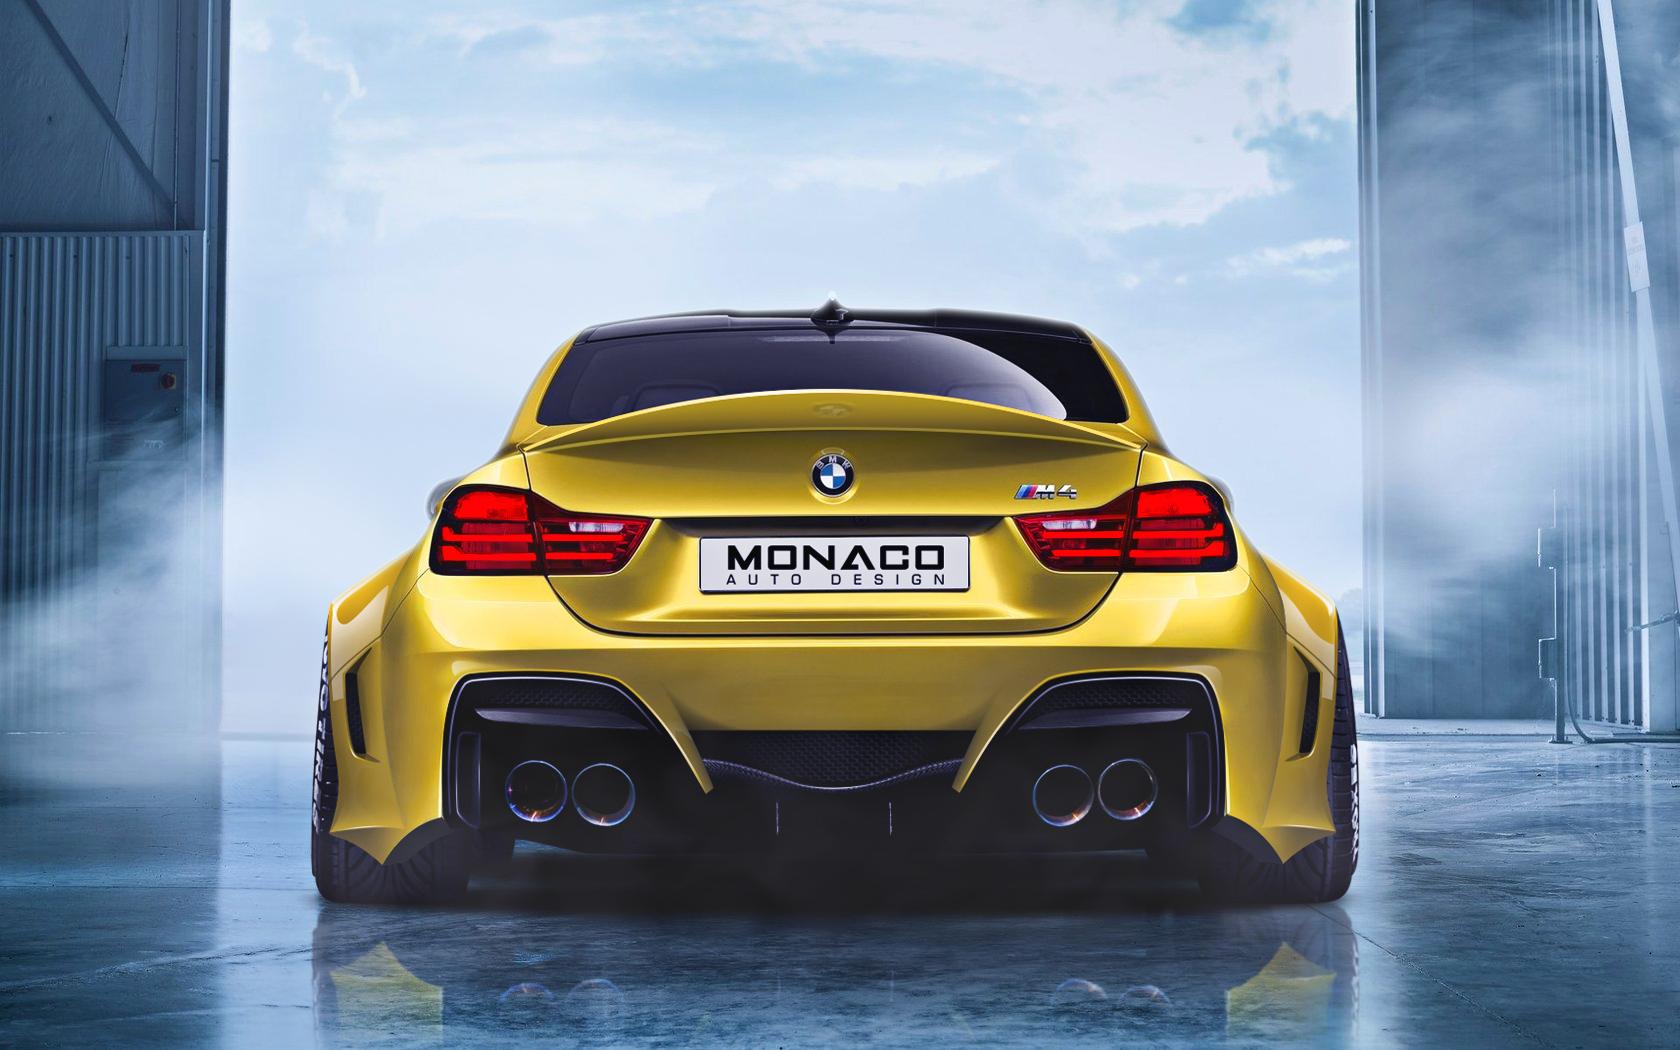 Bmw M4 Widebody Kit Monaco Auto Design By